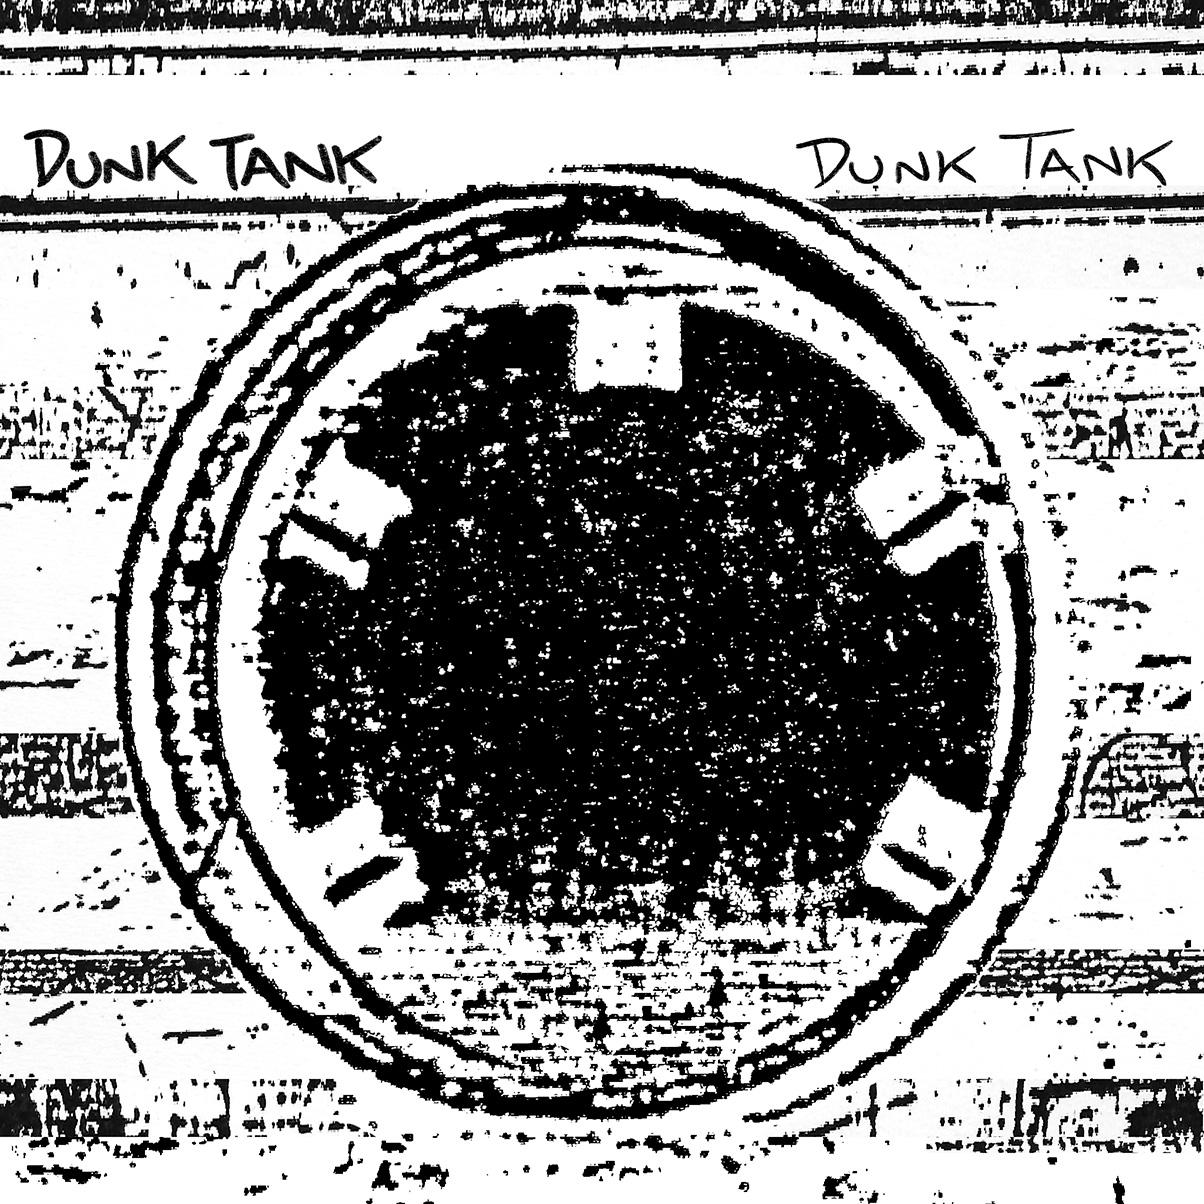 Dunk Tank LP Cover Bandcamp.jpg